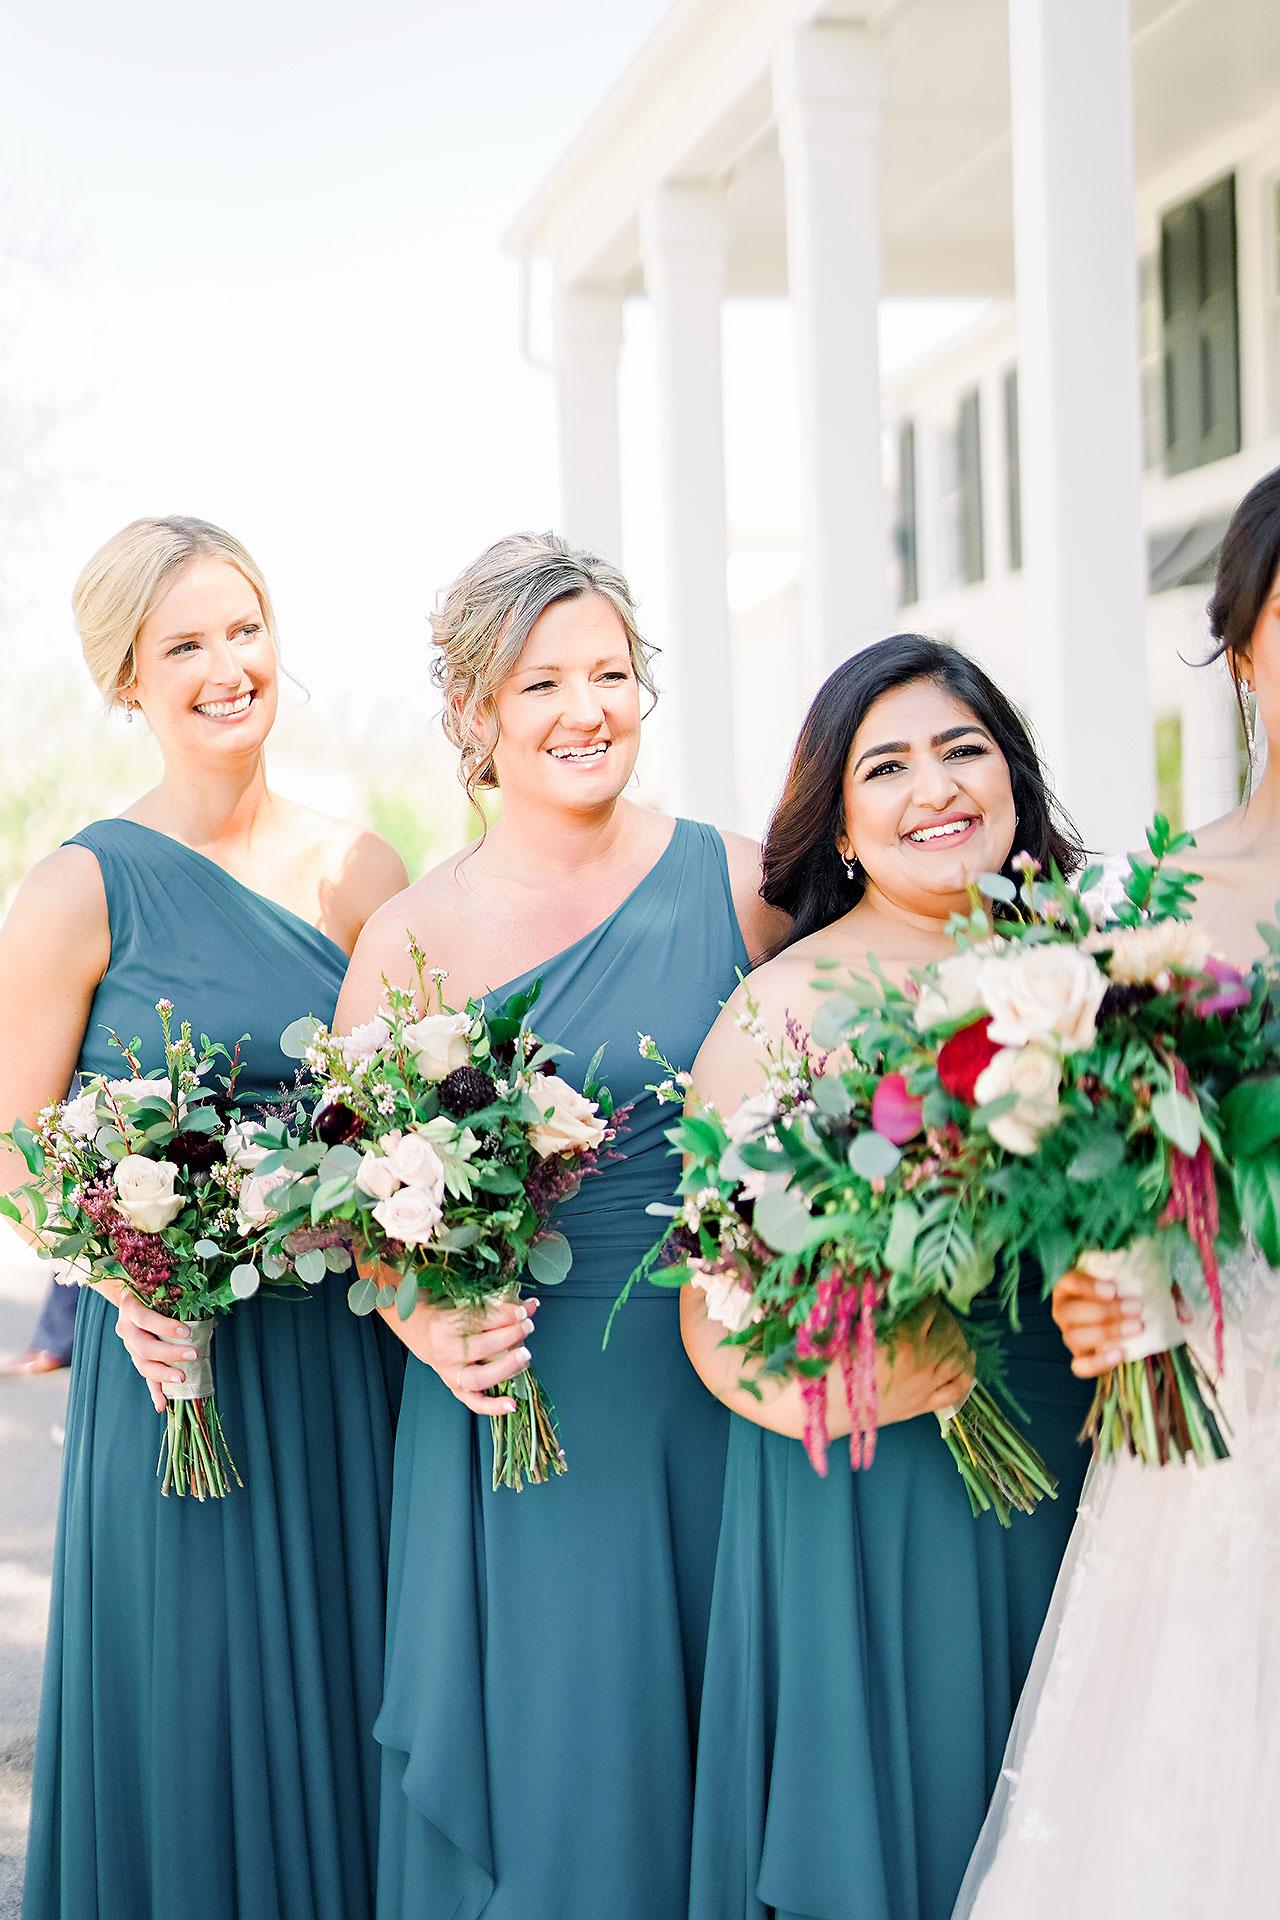 Nadia Parker Black Iris Estate Carmel Indiana Wedding May 2021 149